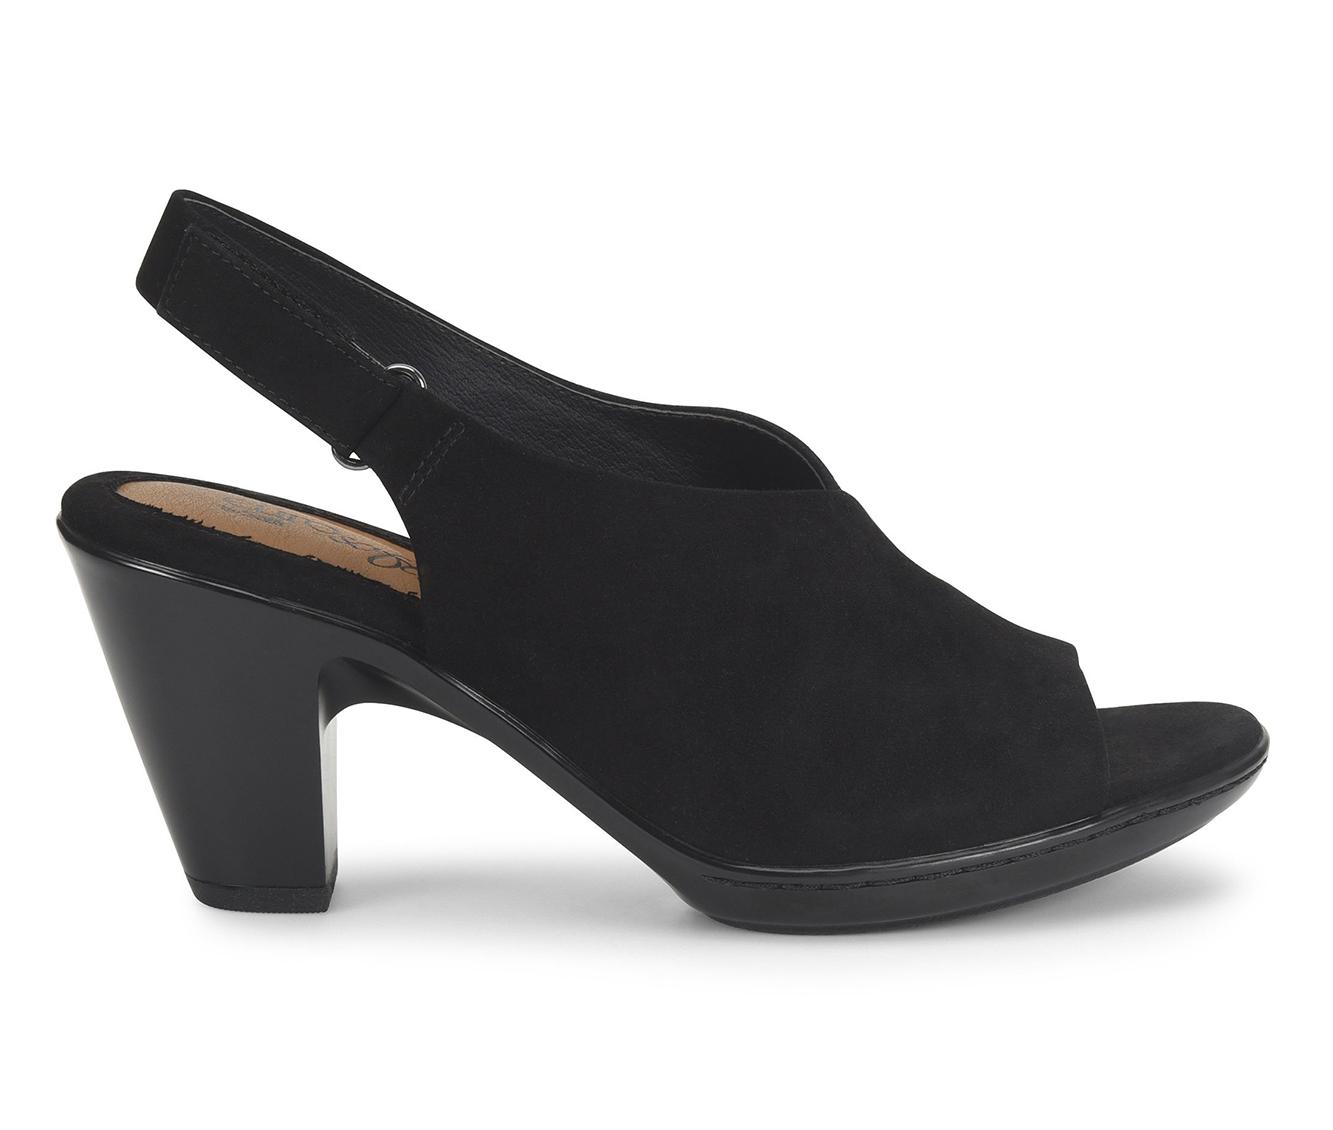 EuroSoft Valona Women's Dress Shoe (Black Suede)